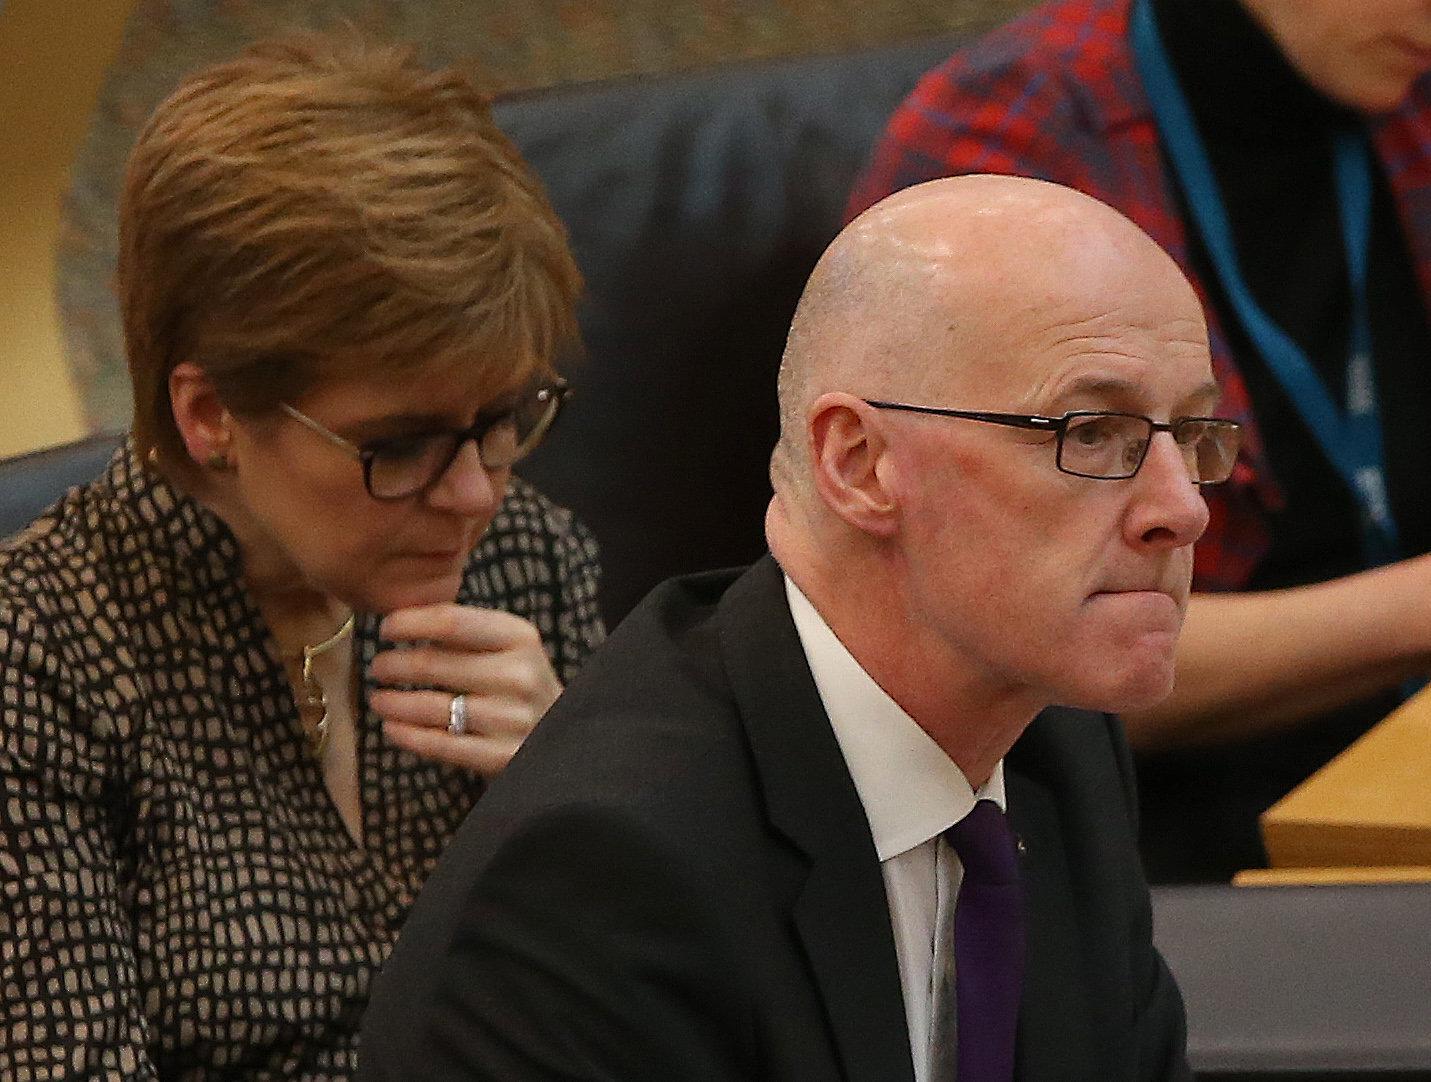 John Swinney admits Government kept defending Alex Salmond case despite 'reservations' | HeraldScotland